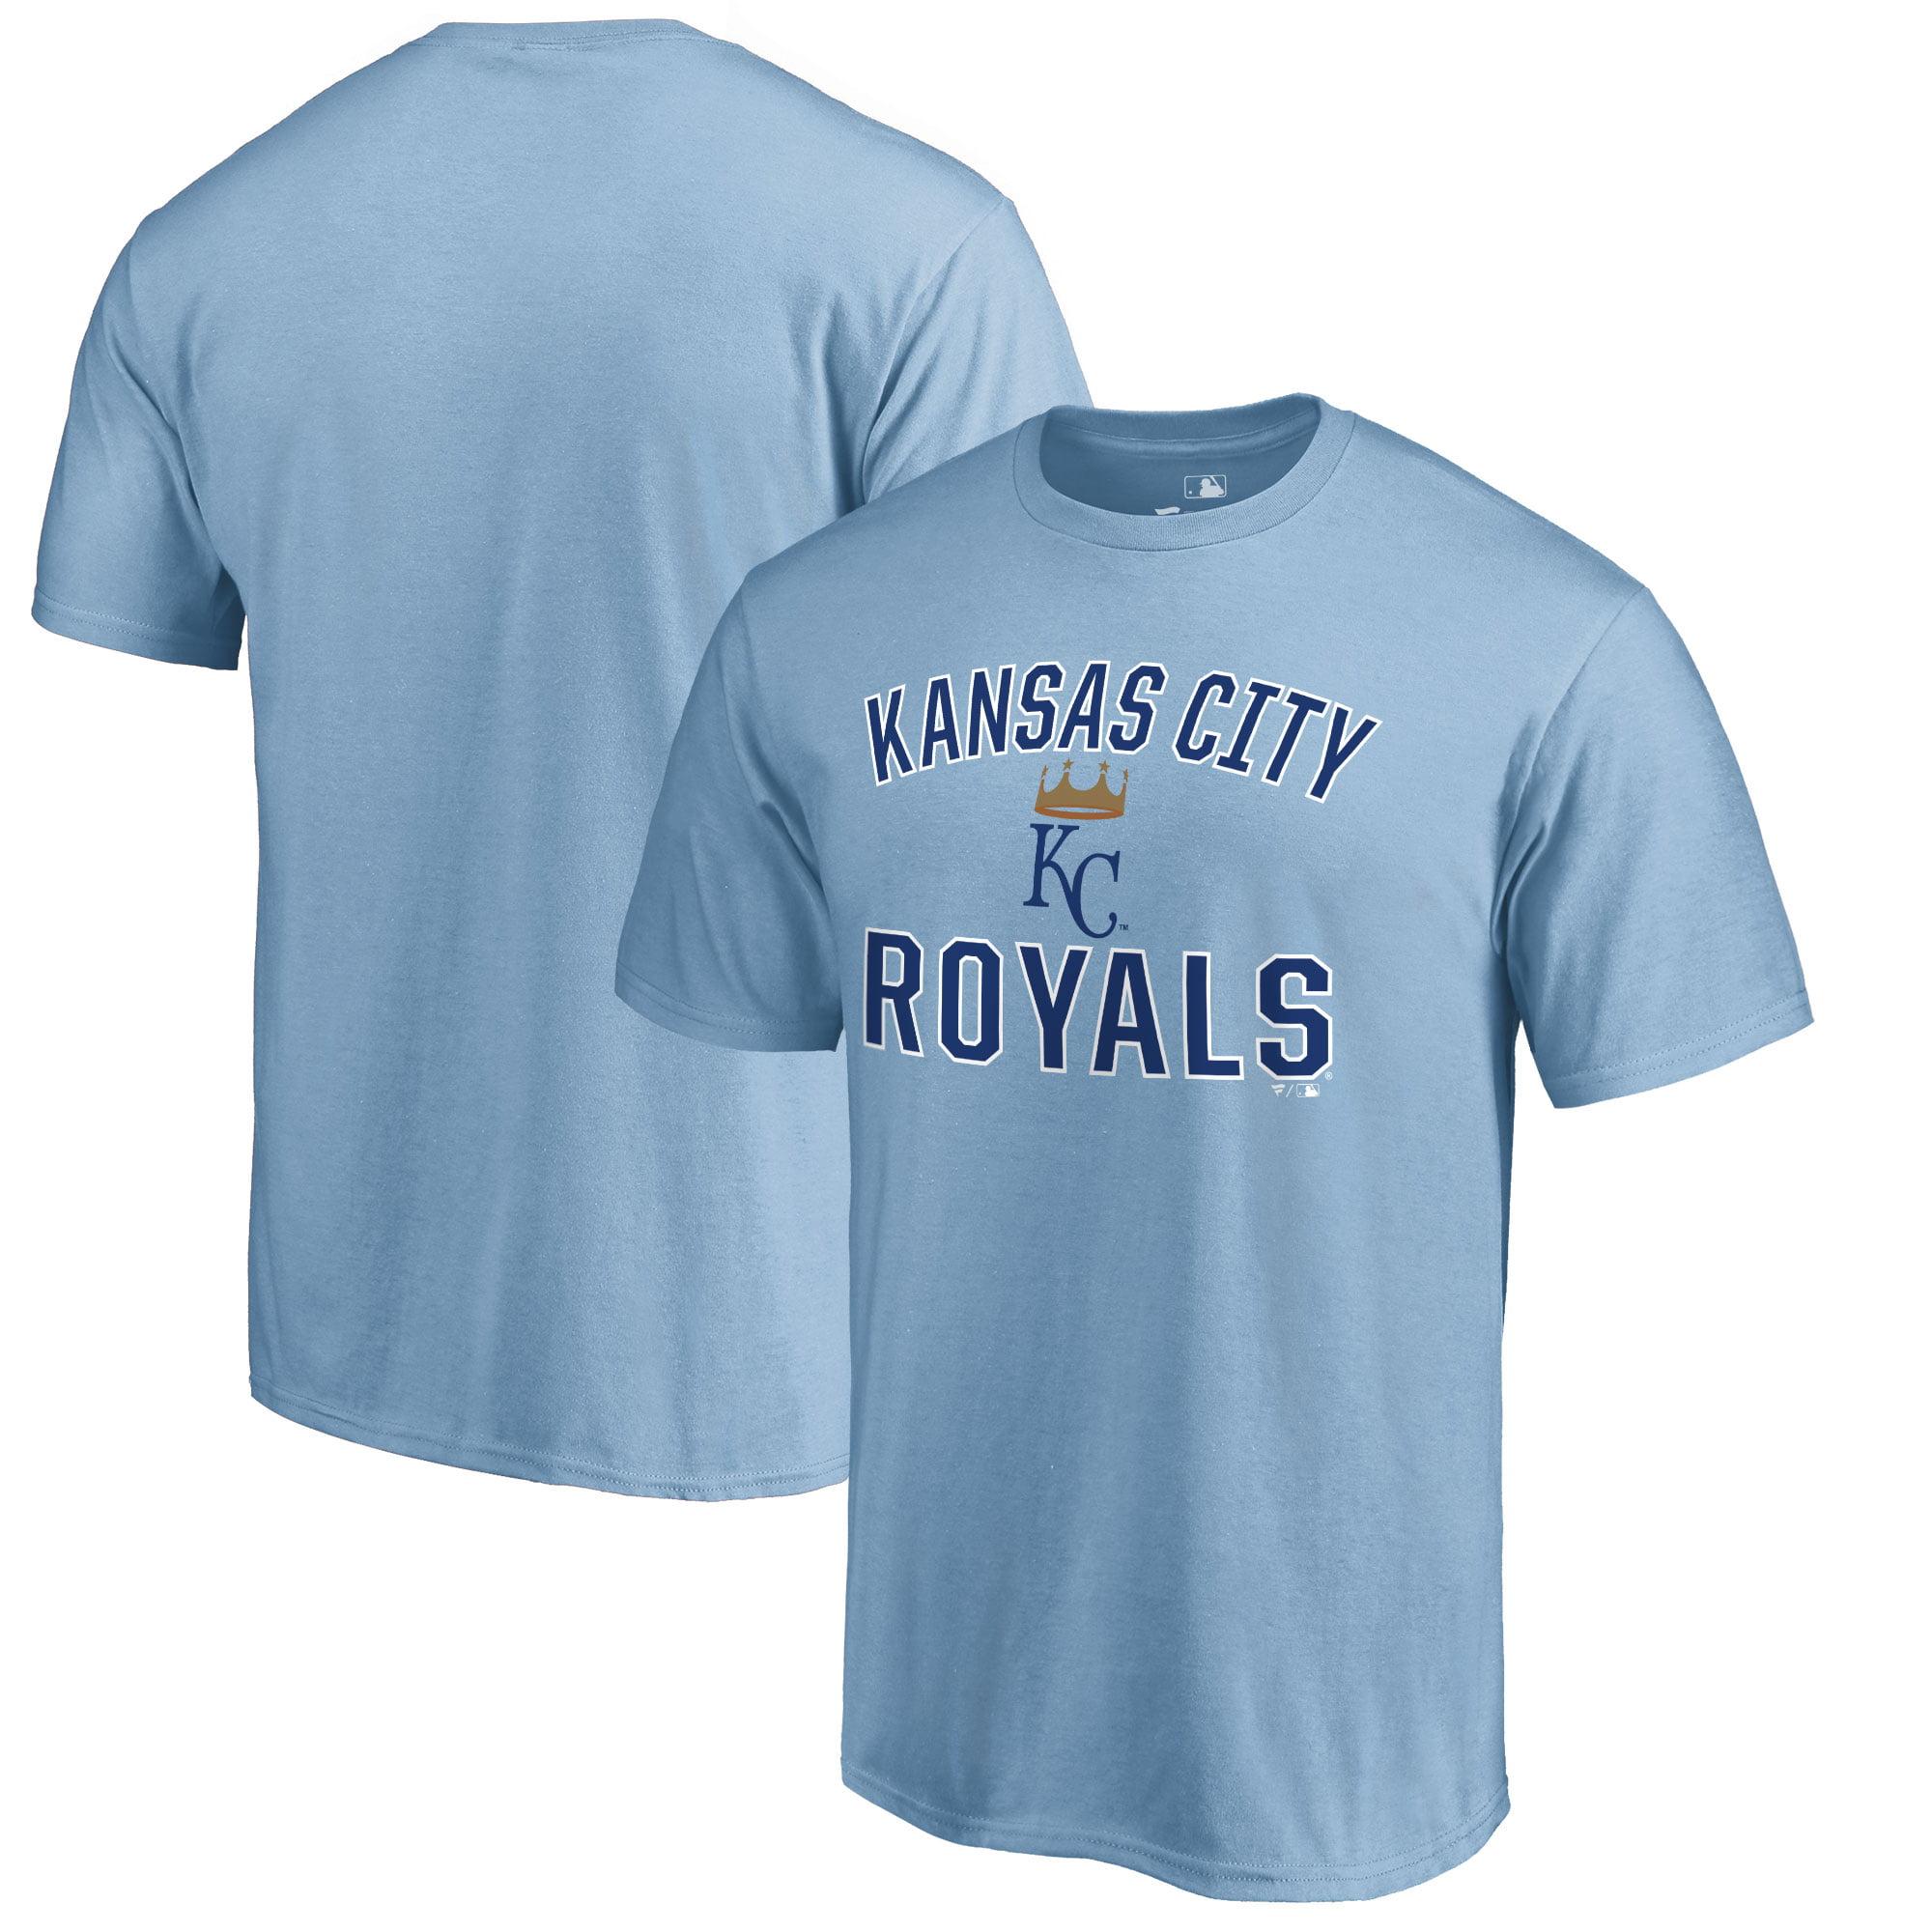 Kansas City Royals Victory Arch T-Shirt - Light Blue